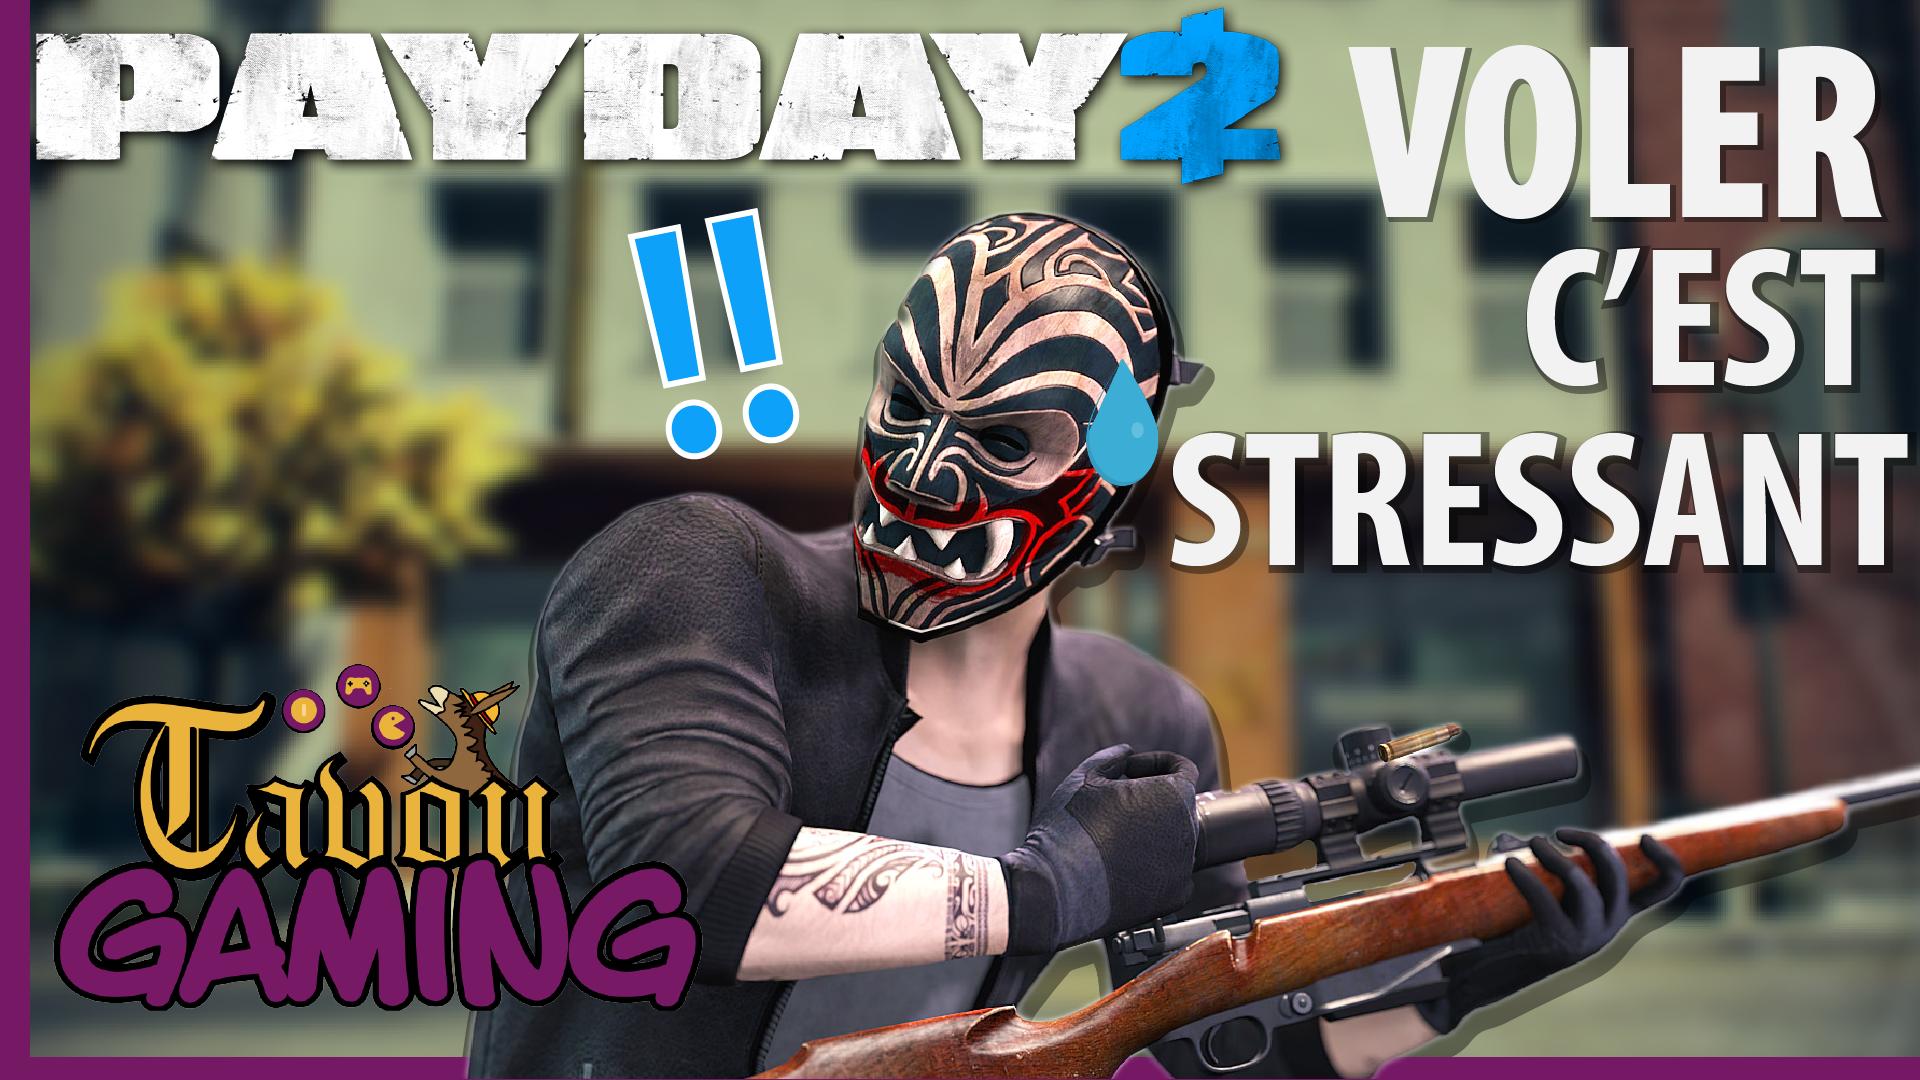 VOLER, c'est stressant | PayDay 2